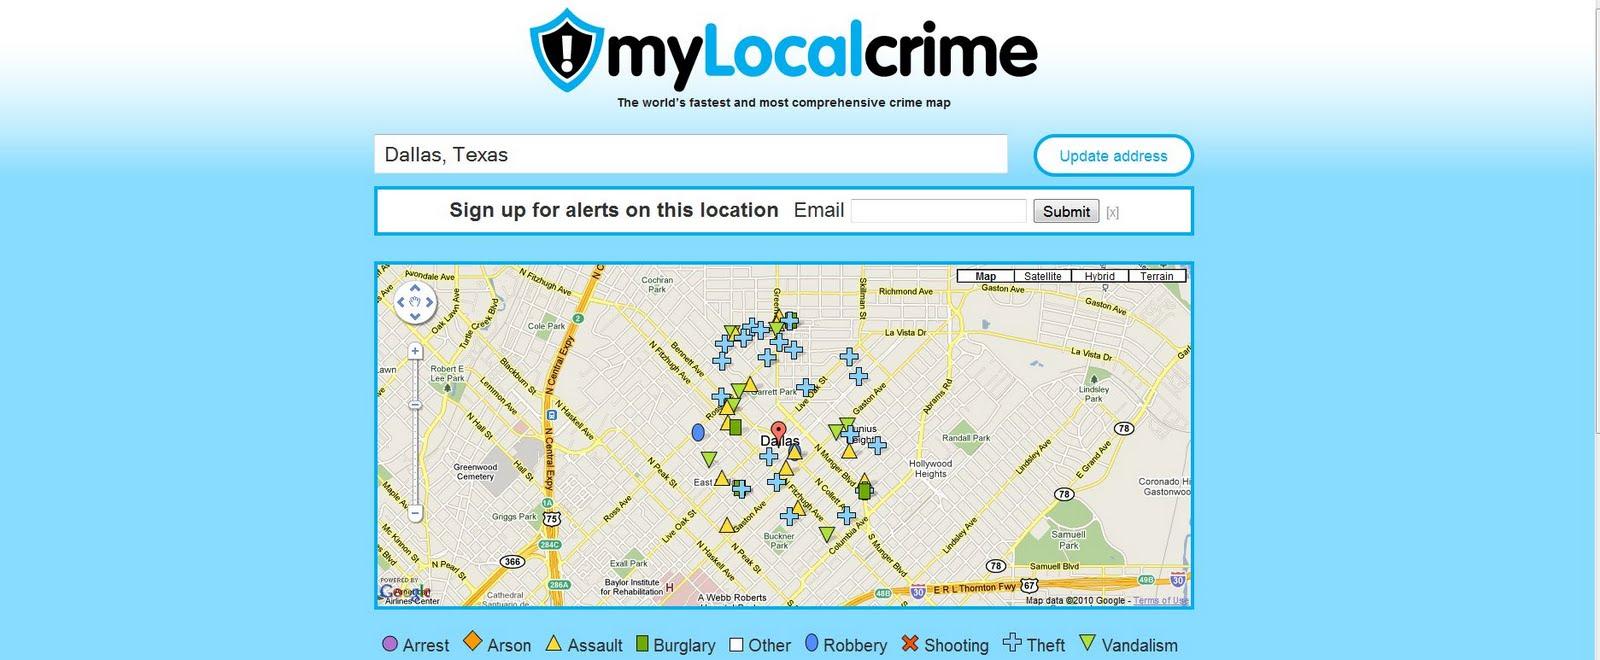 Crime Maps Around the World: Dallas Texas Crime Map on